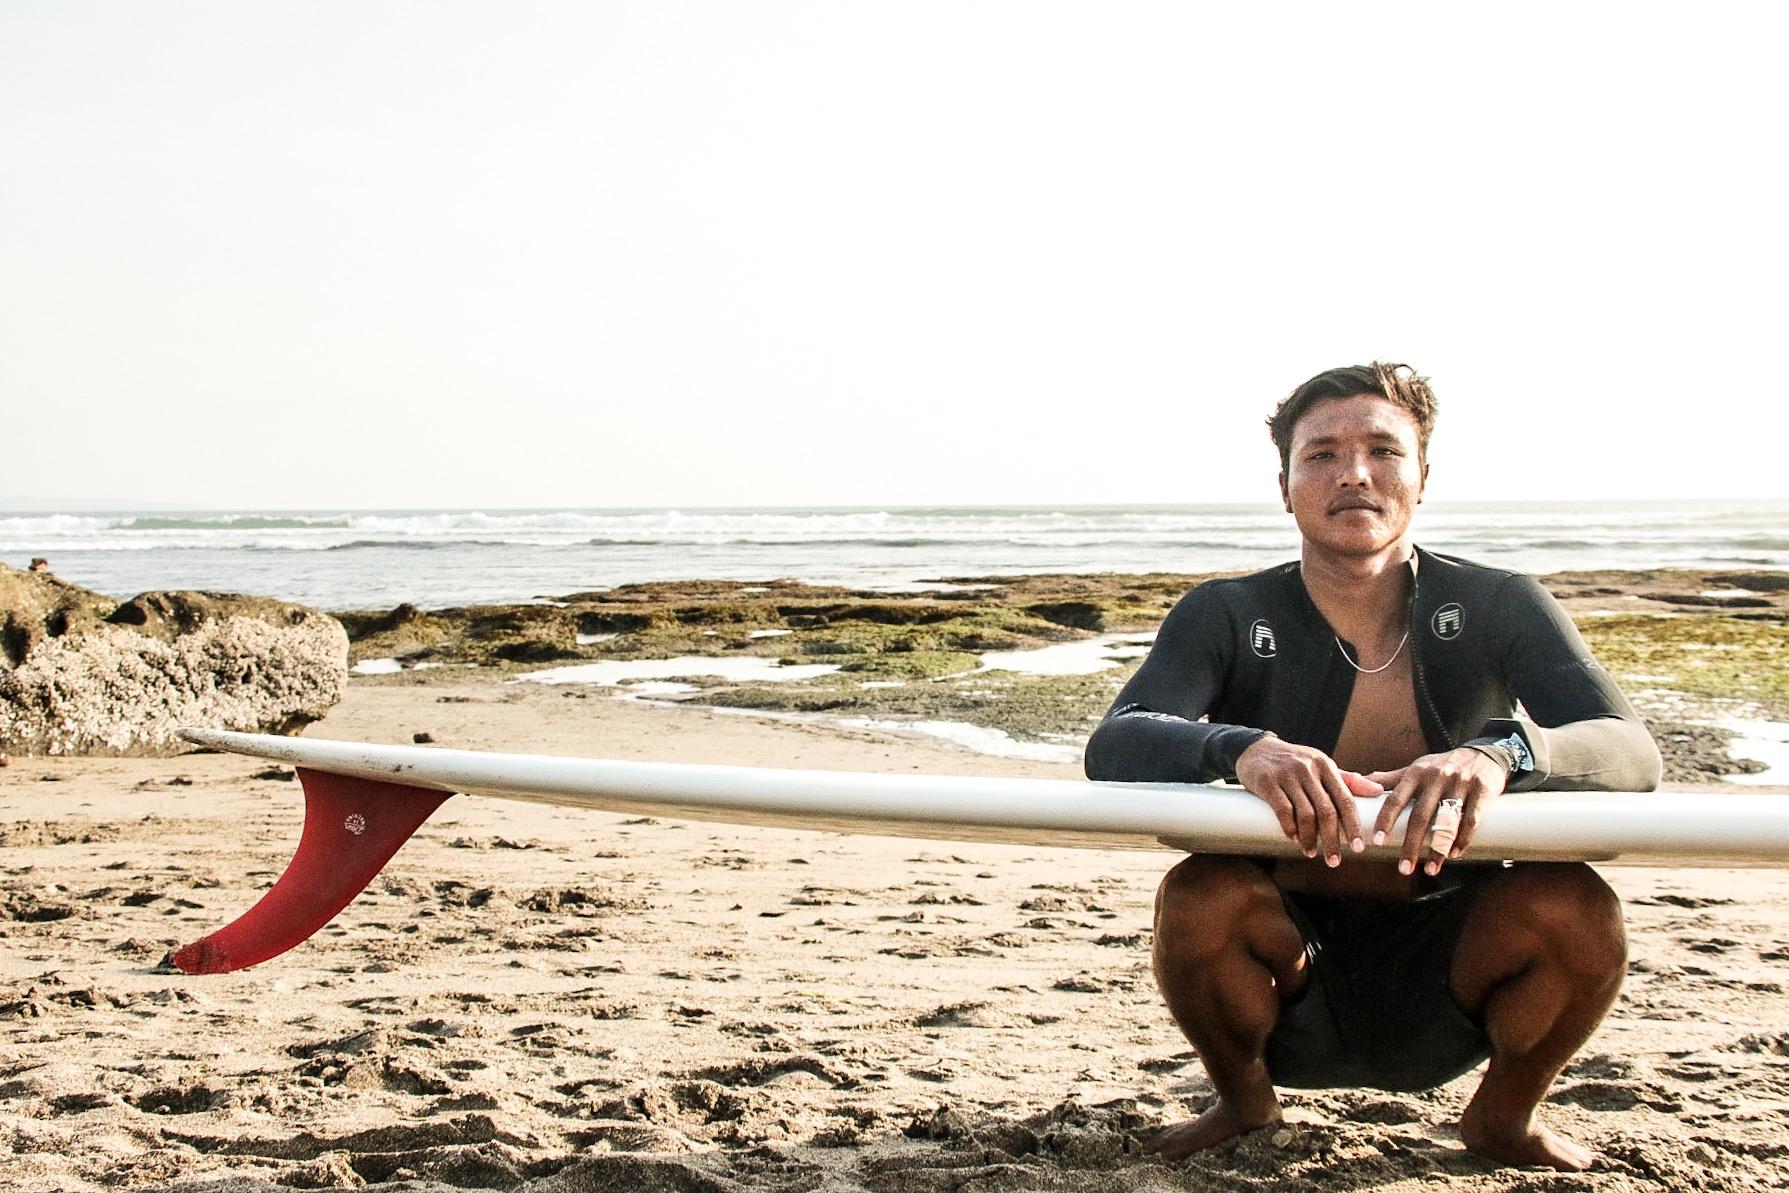 ayok canggu interview photo six credit jemma scott mvmnt surf savage thrills